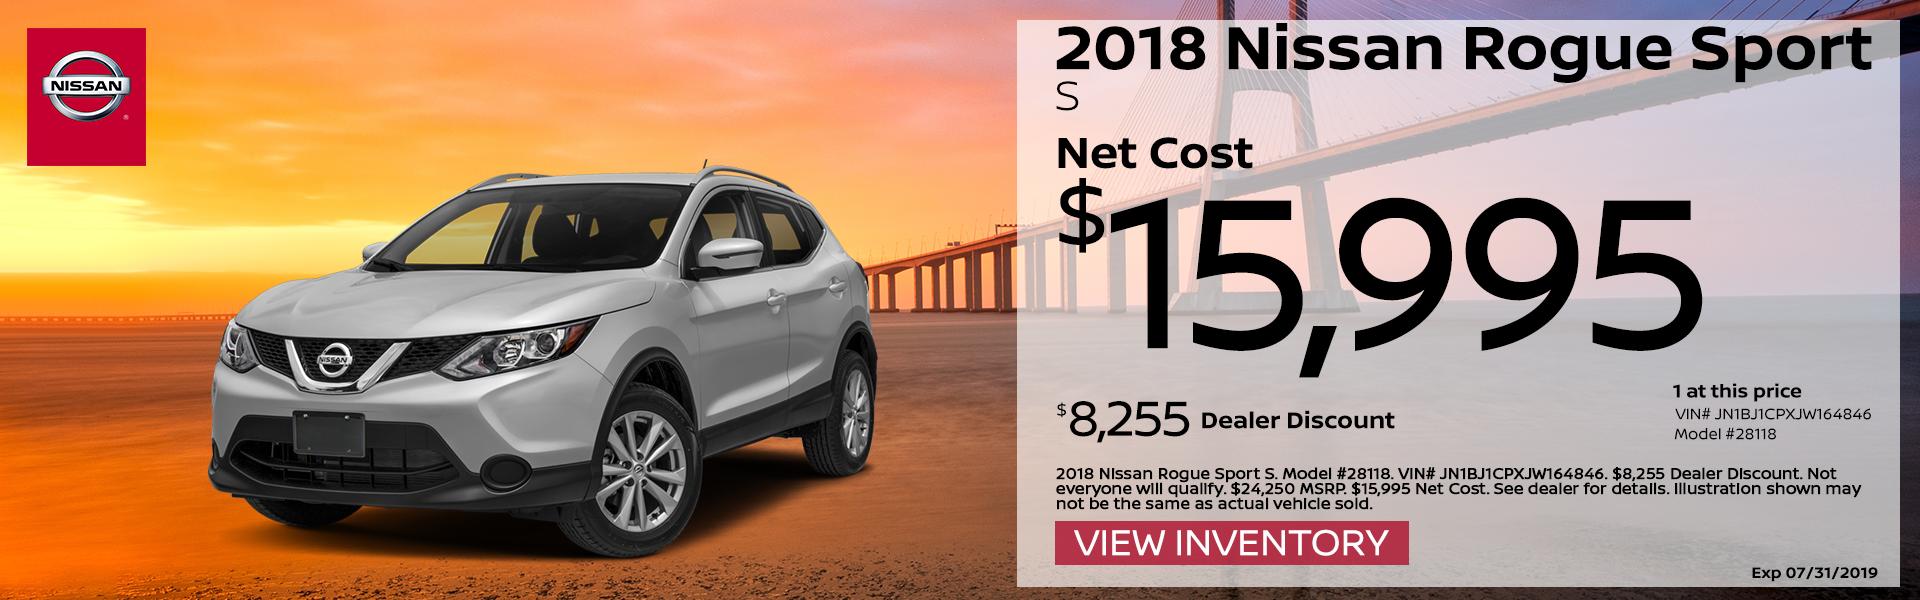 2018 Nissan Rogue Sport Special